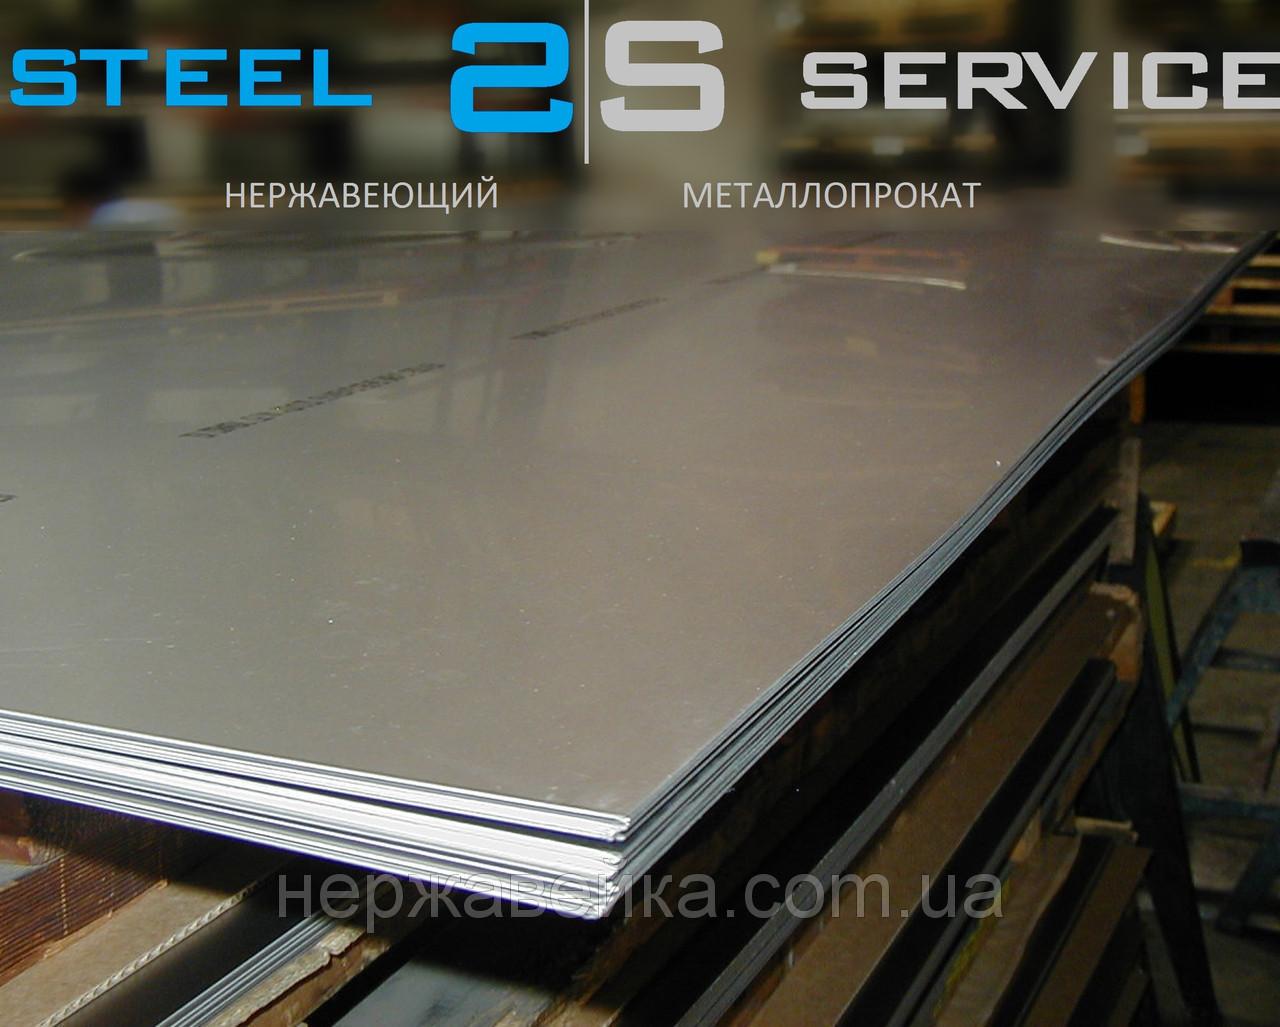 Нержавейка лист 4х1250х2500мм  AISI 316L(03Х17Н14М3) 2B - матовый,  кислотостойкий